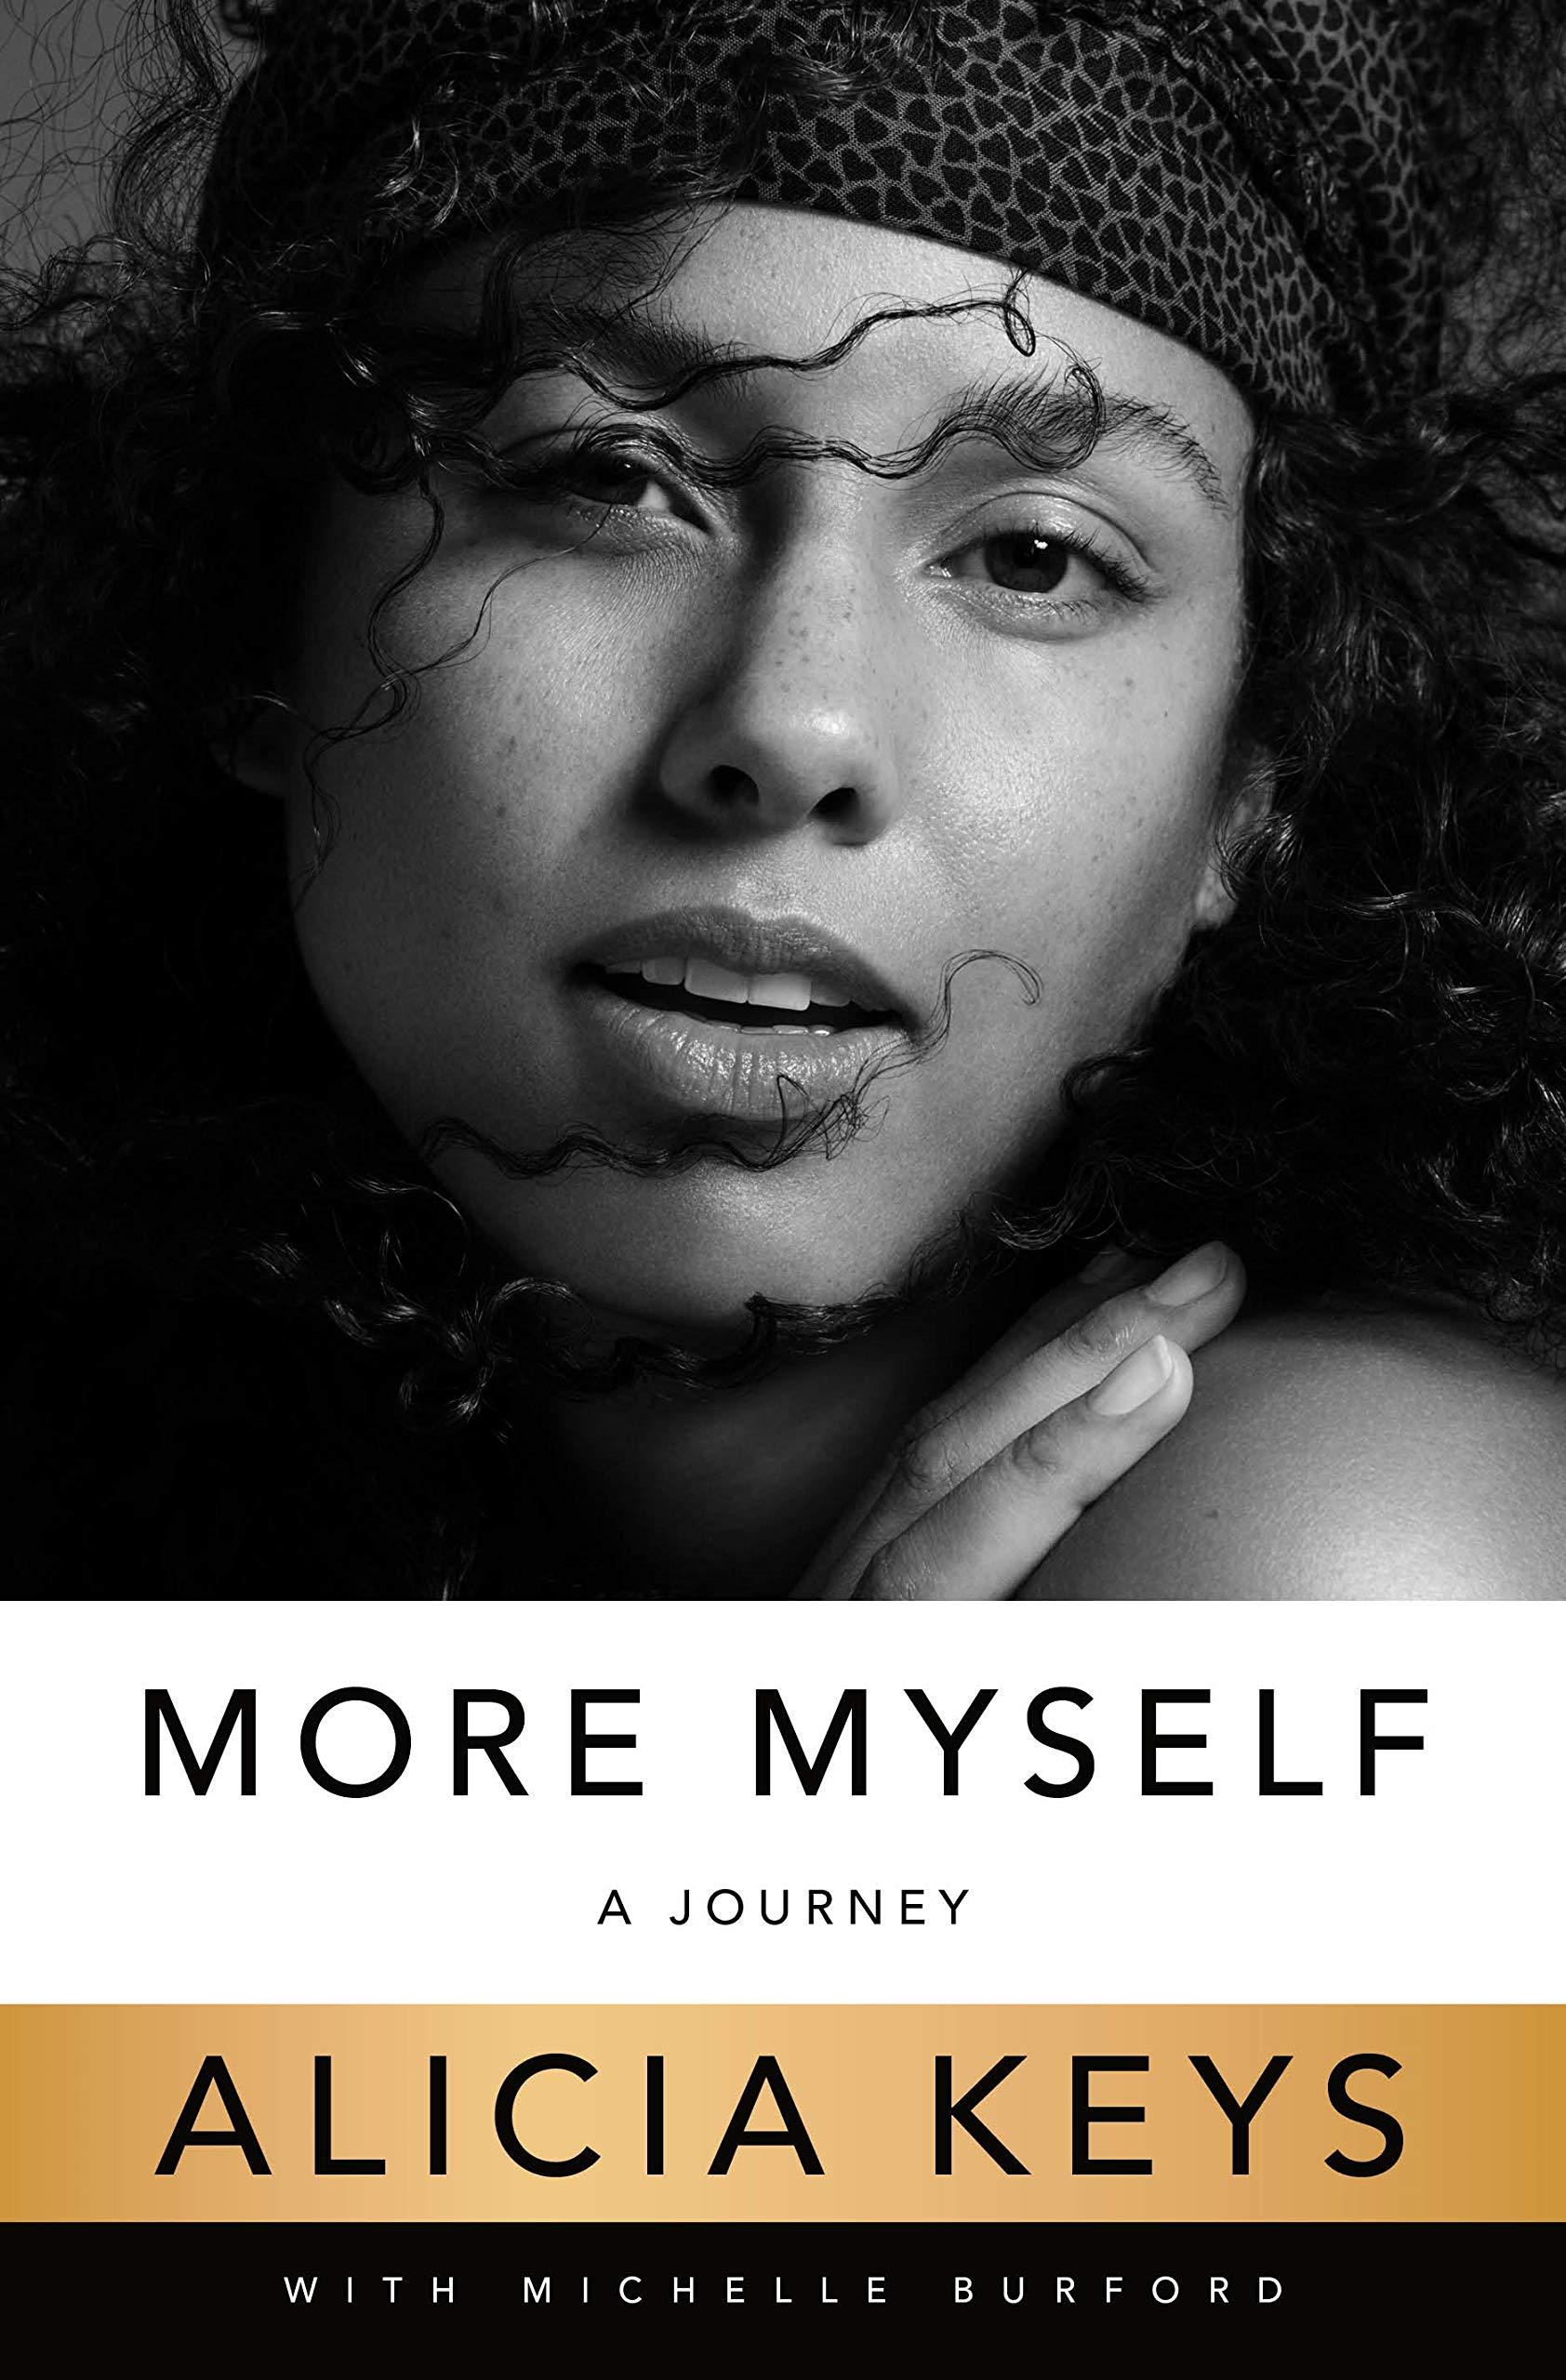 More Myself A Journey Keys Alicia 9781250153296 Amazon Com Books